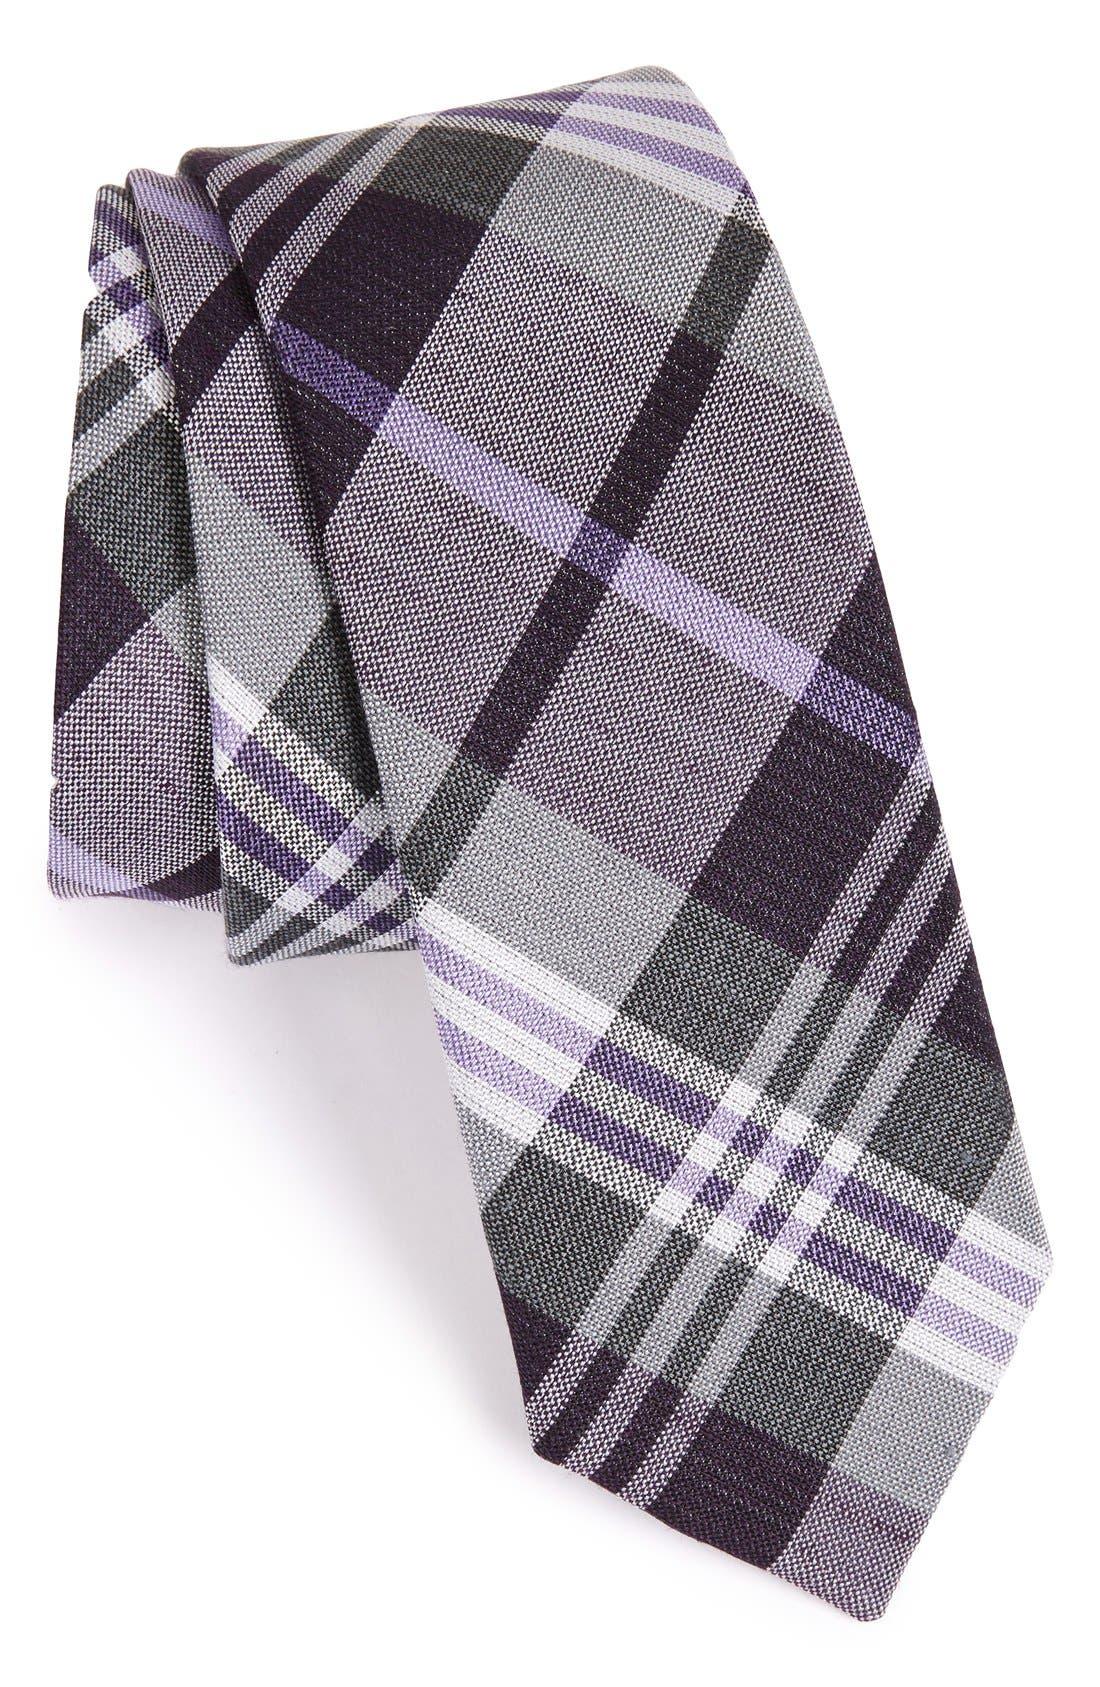 Alternate Image 1 Selected - The Tie Bar Plaid Silk & Linen Tie